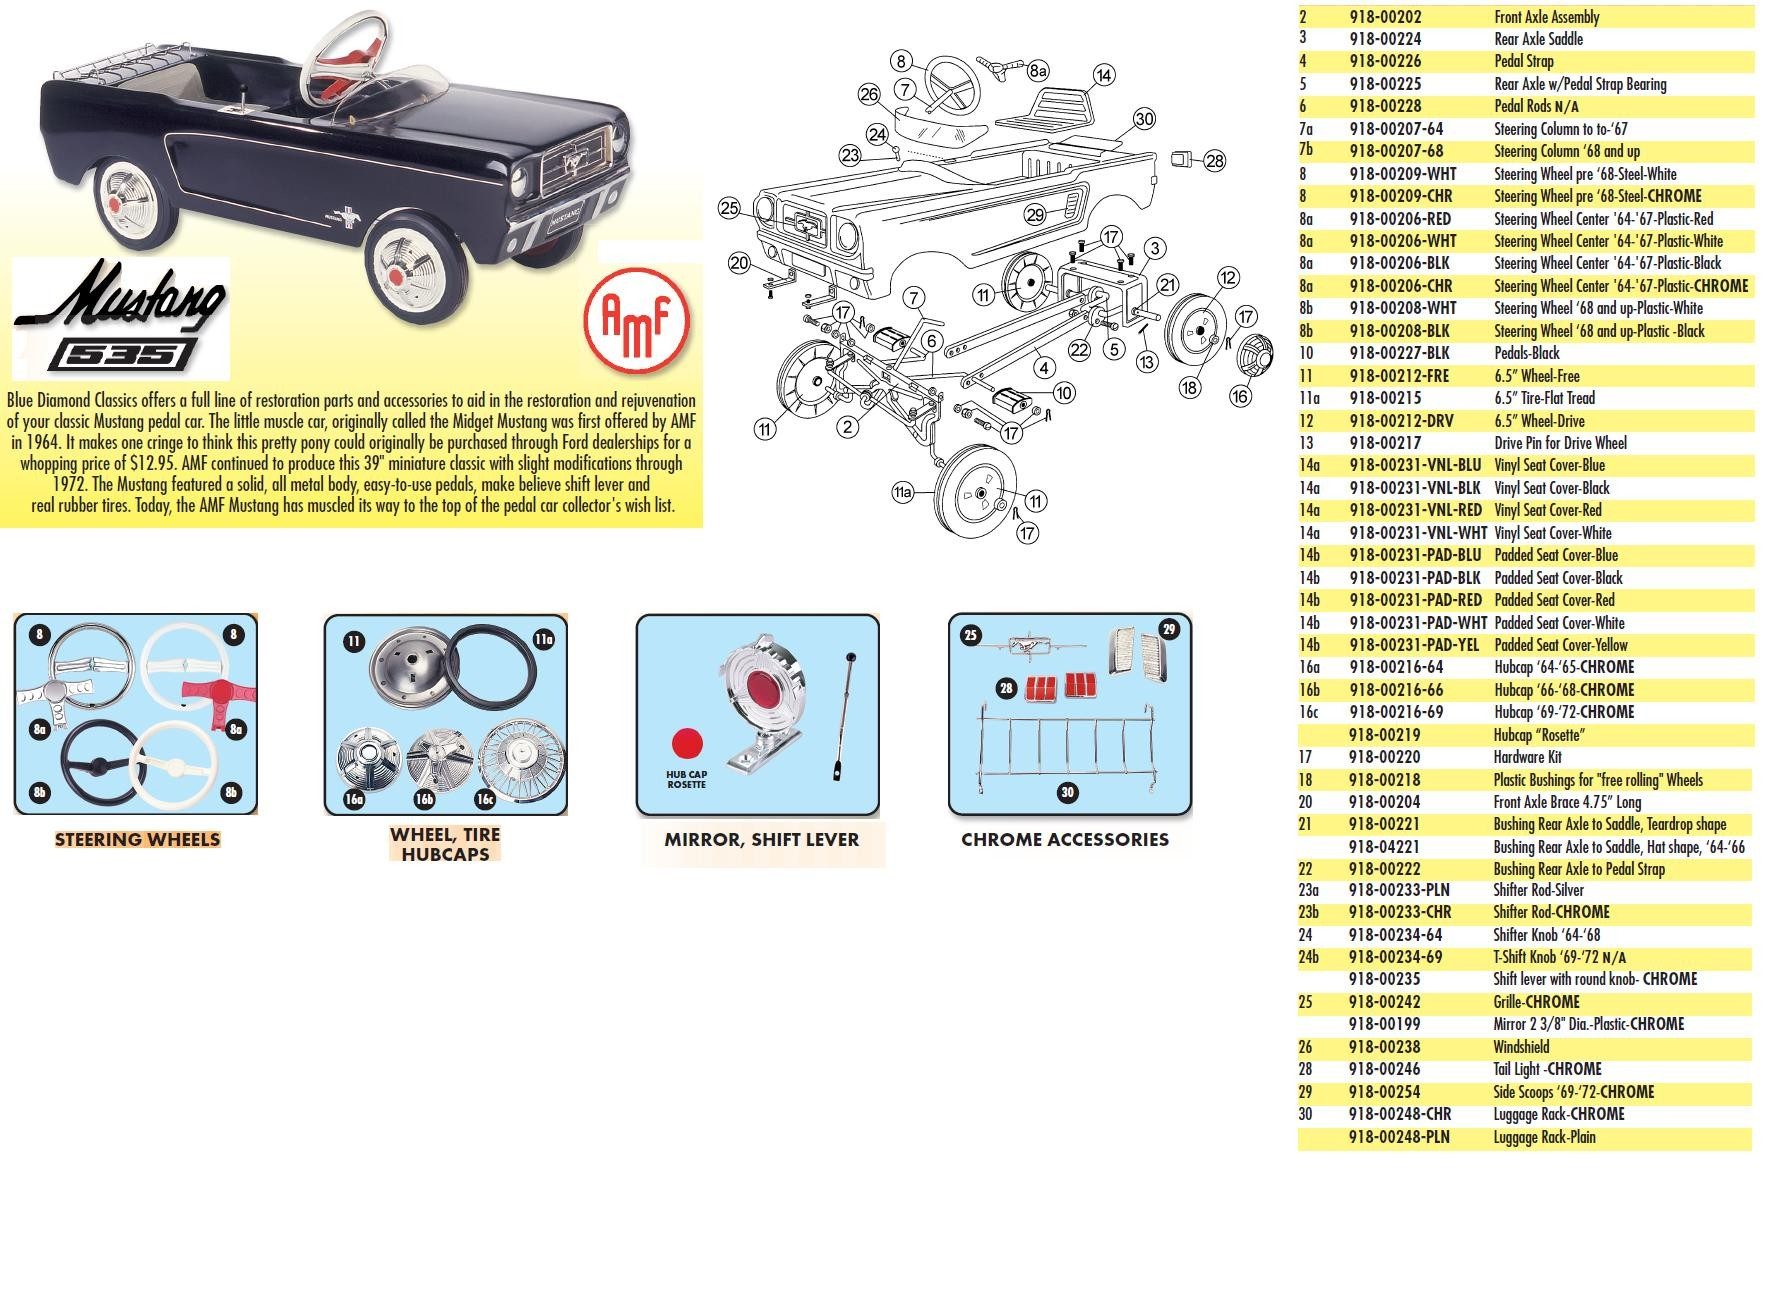 Parts Of A Car Wheel Diagram 6 5 Inch Pedal Car Tire Of Parts Of A Car Wheel Diagram